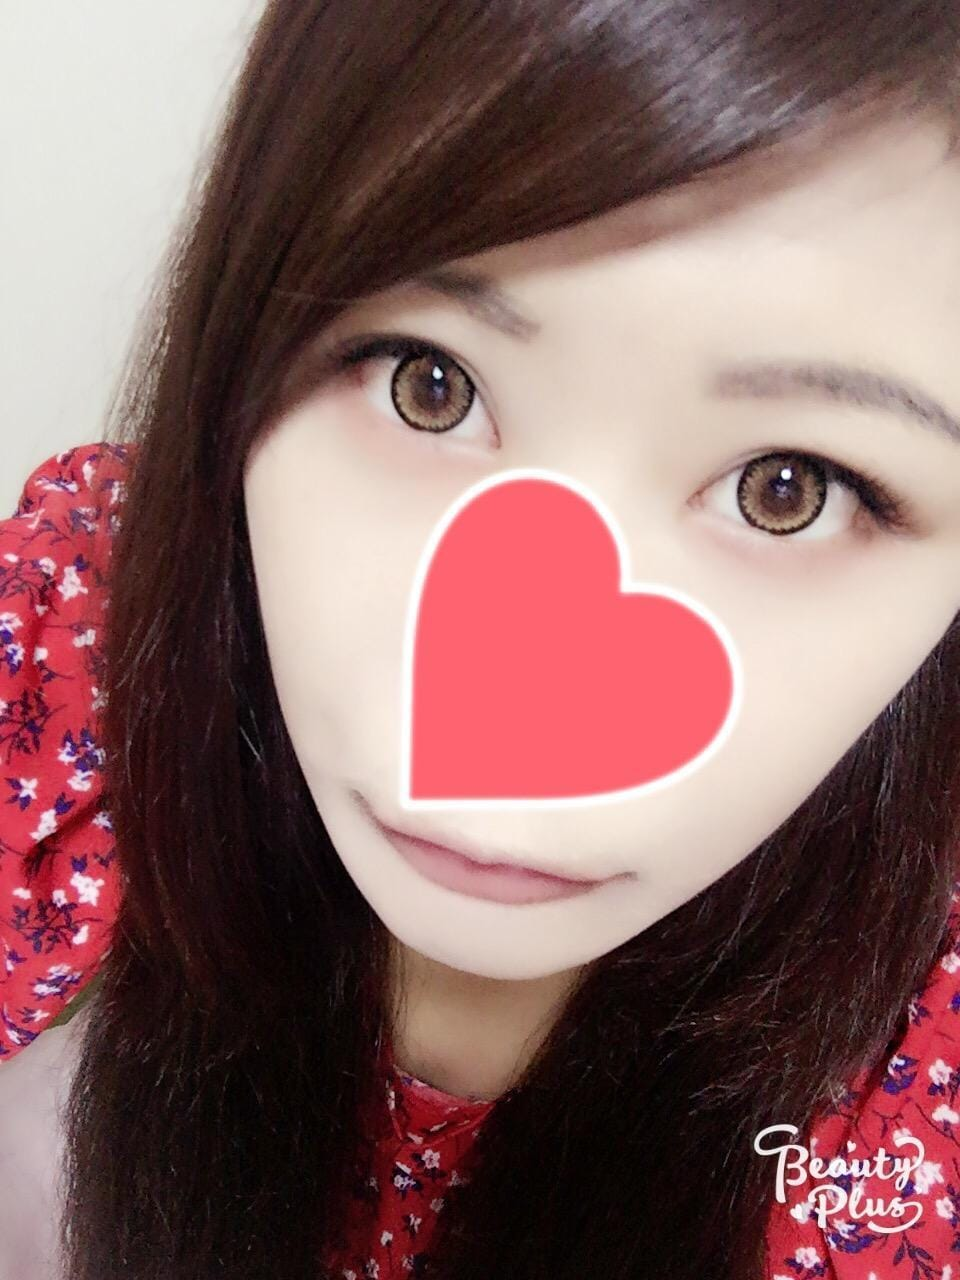 「November 19th ★」11/19(11/19) 18:10 | まどかの写メ・風俗動画